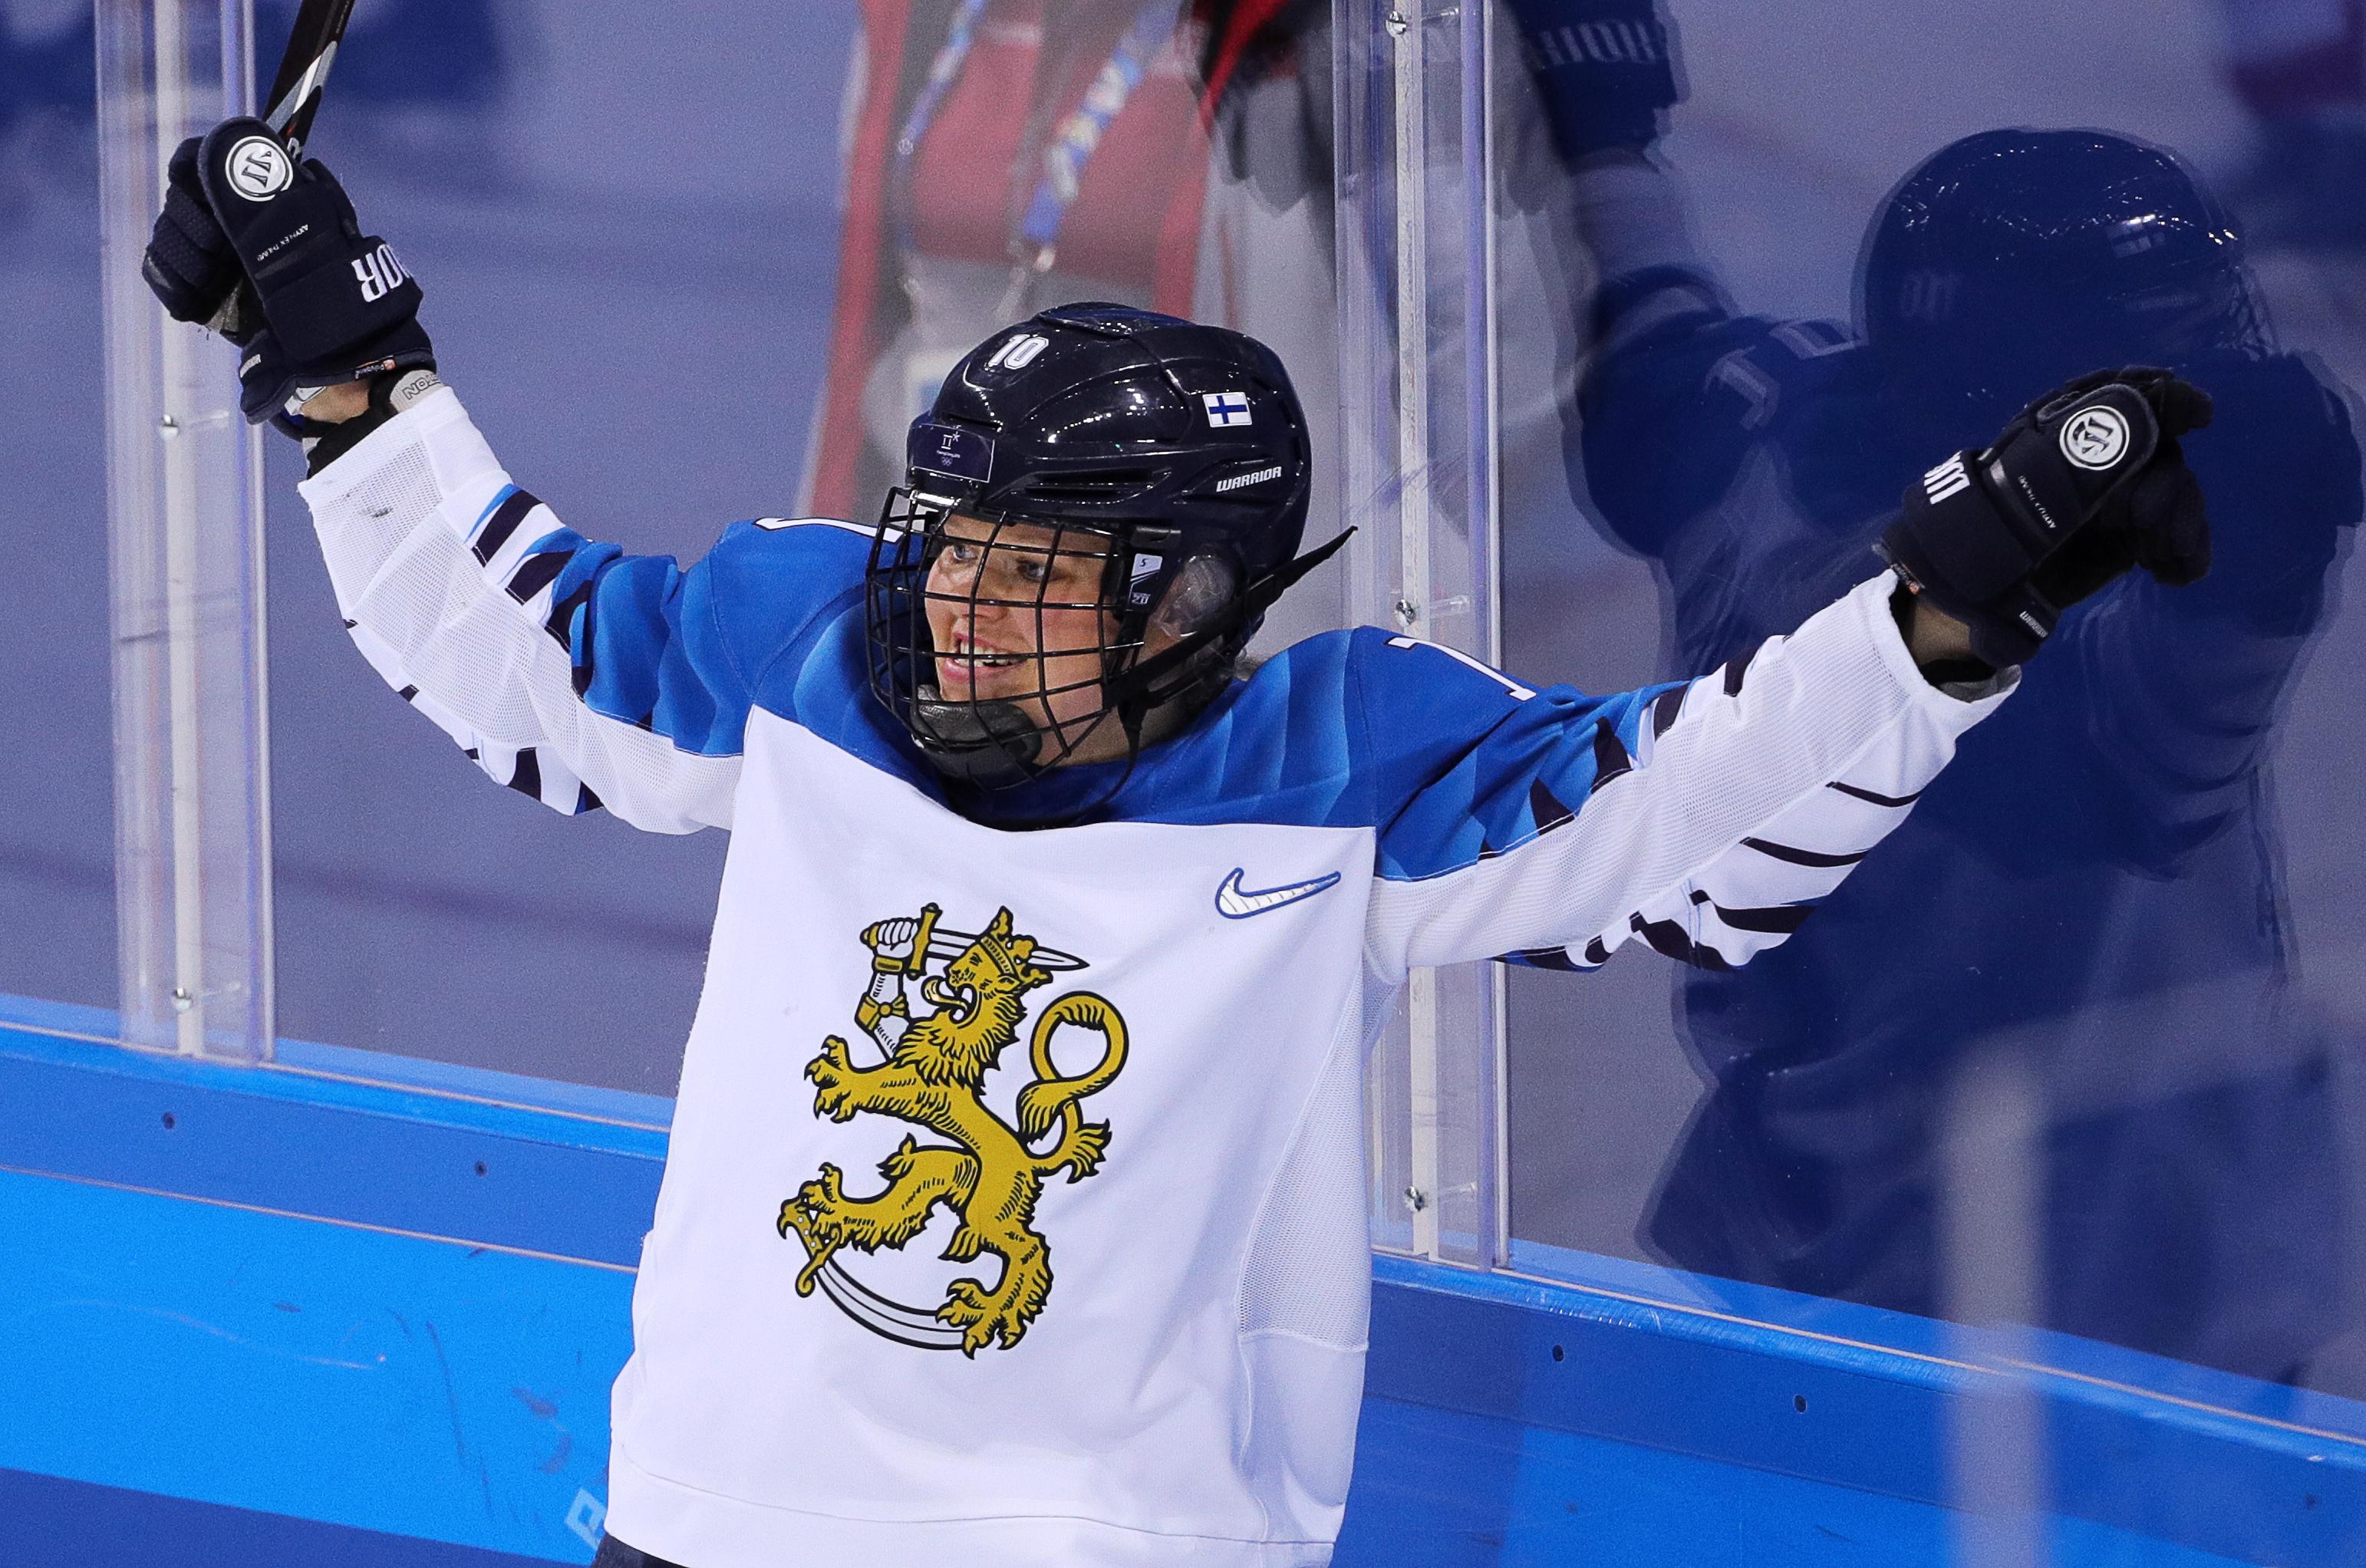 PyeongChang 2018 Olympics: women's ice hockey bronze medal match